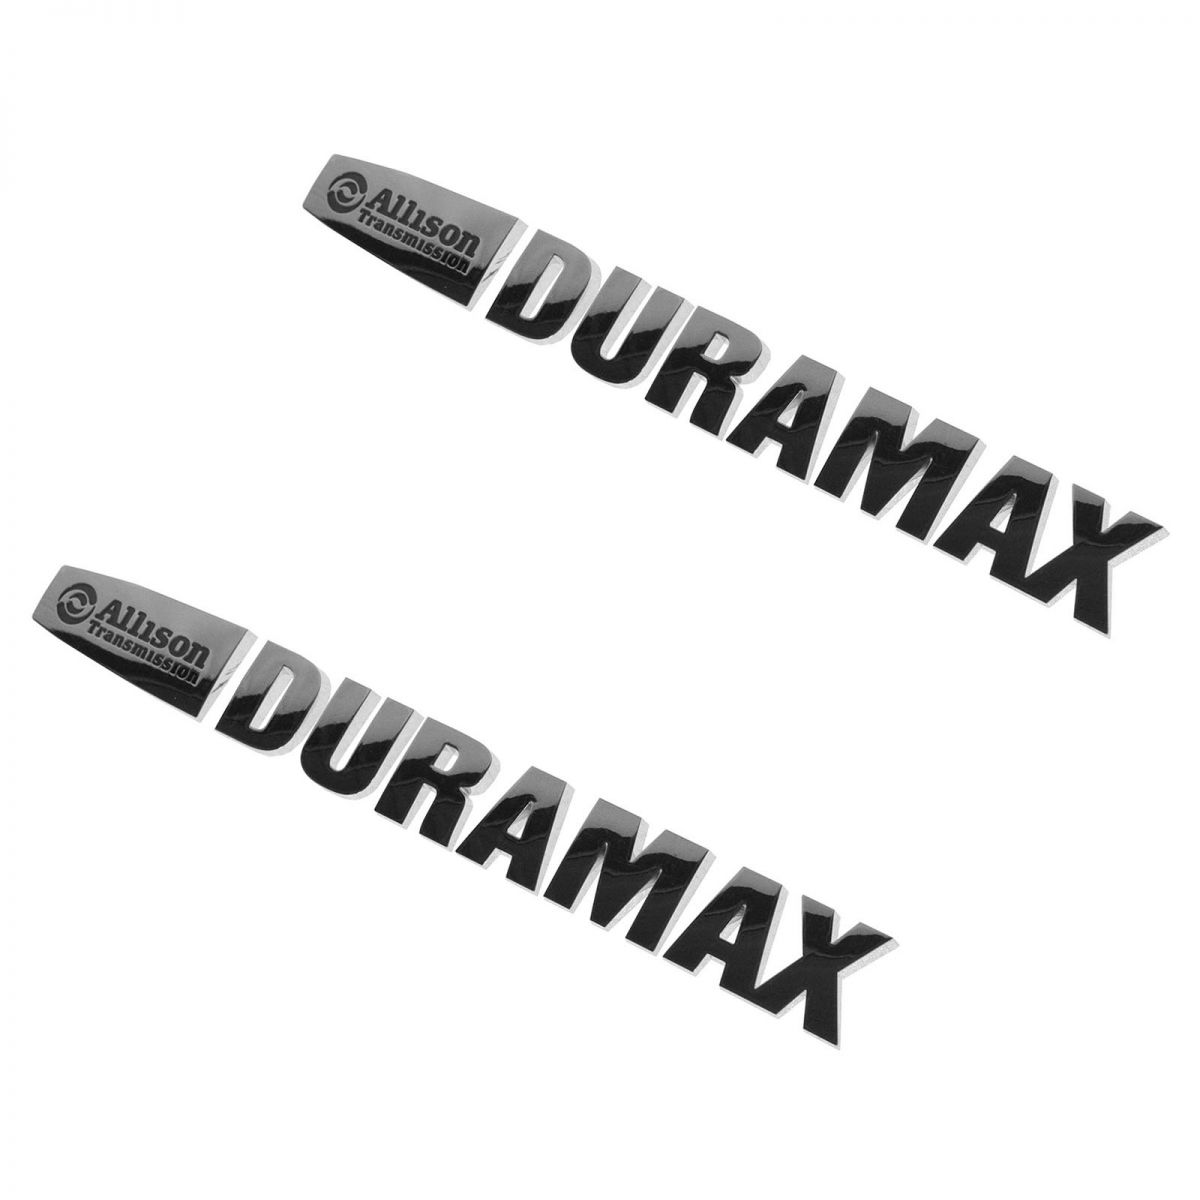 Gm Allison Duramax Emblem Letter Set Chrome Pair For 15